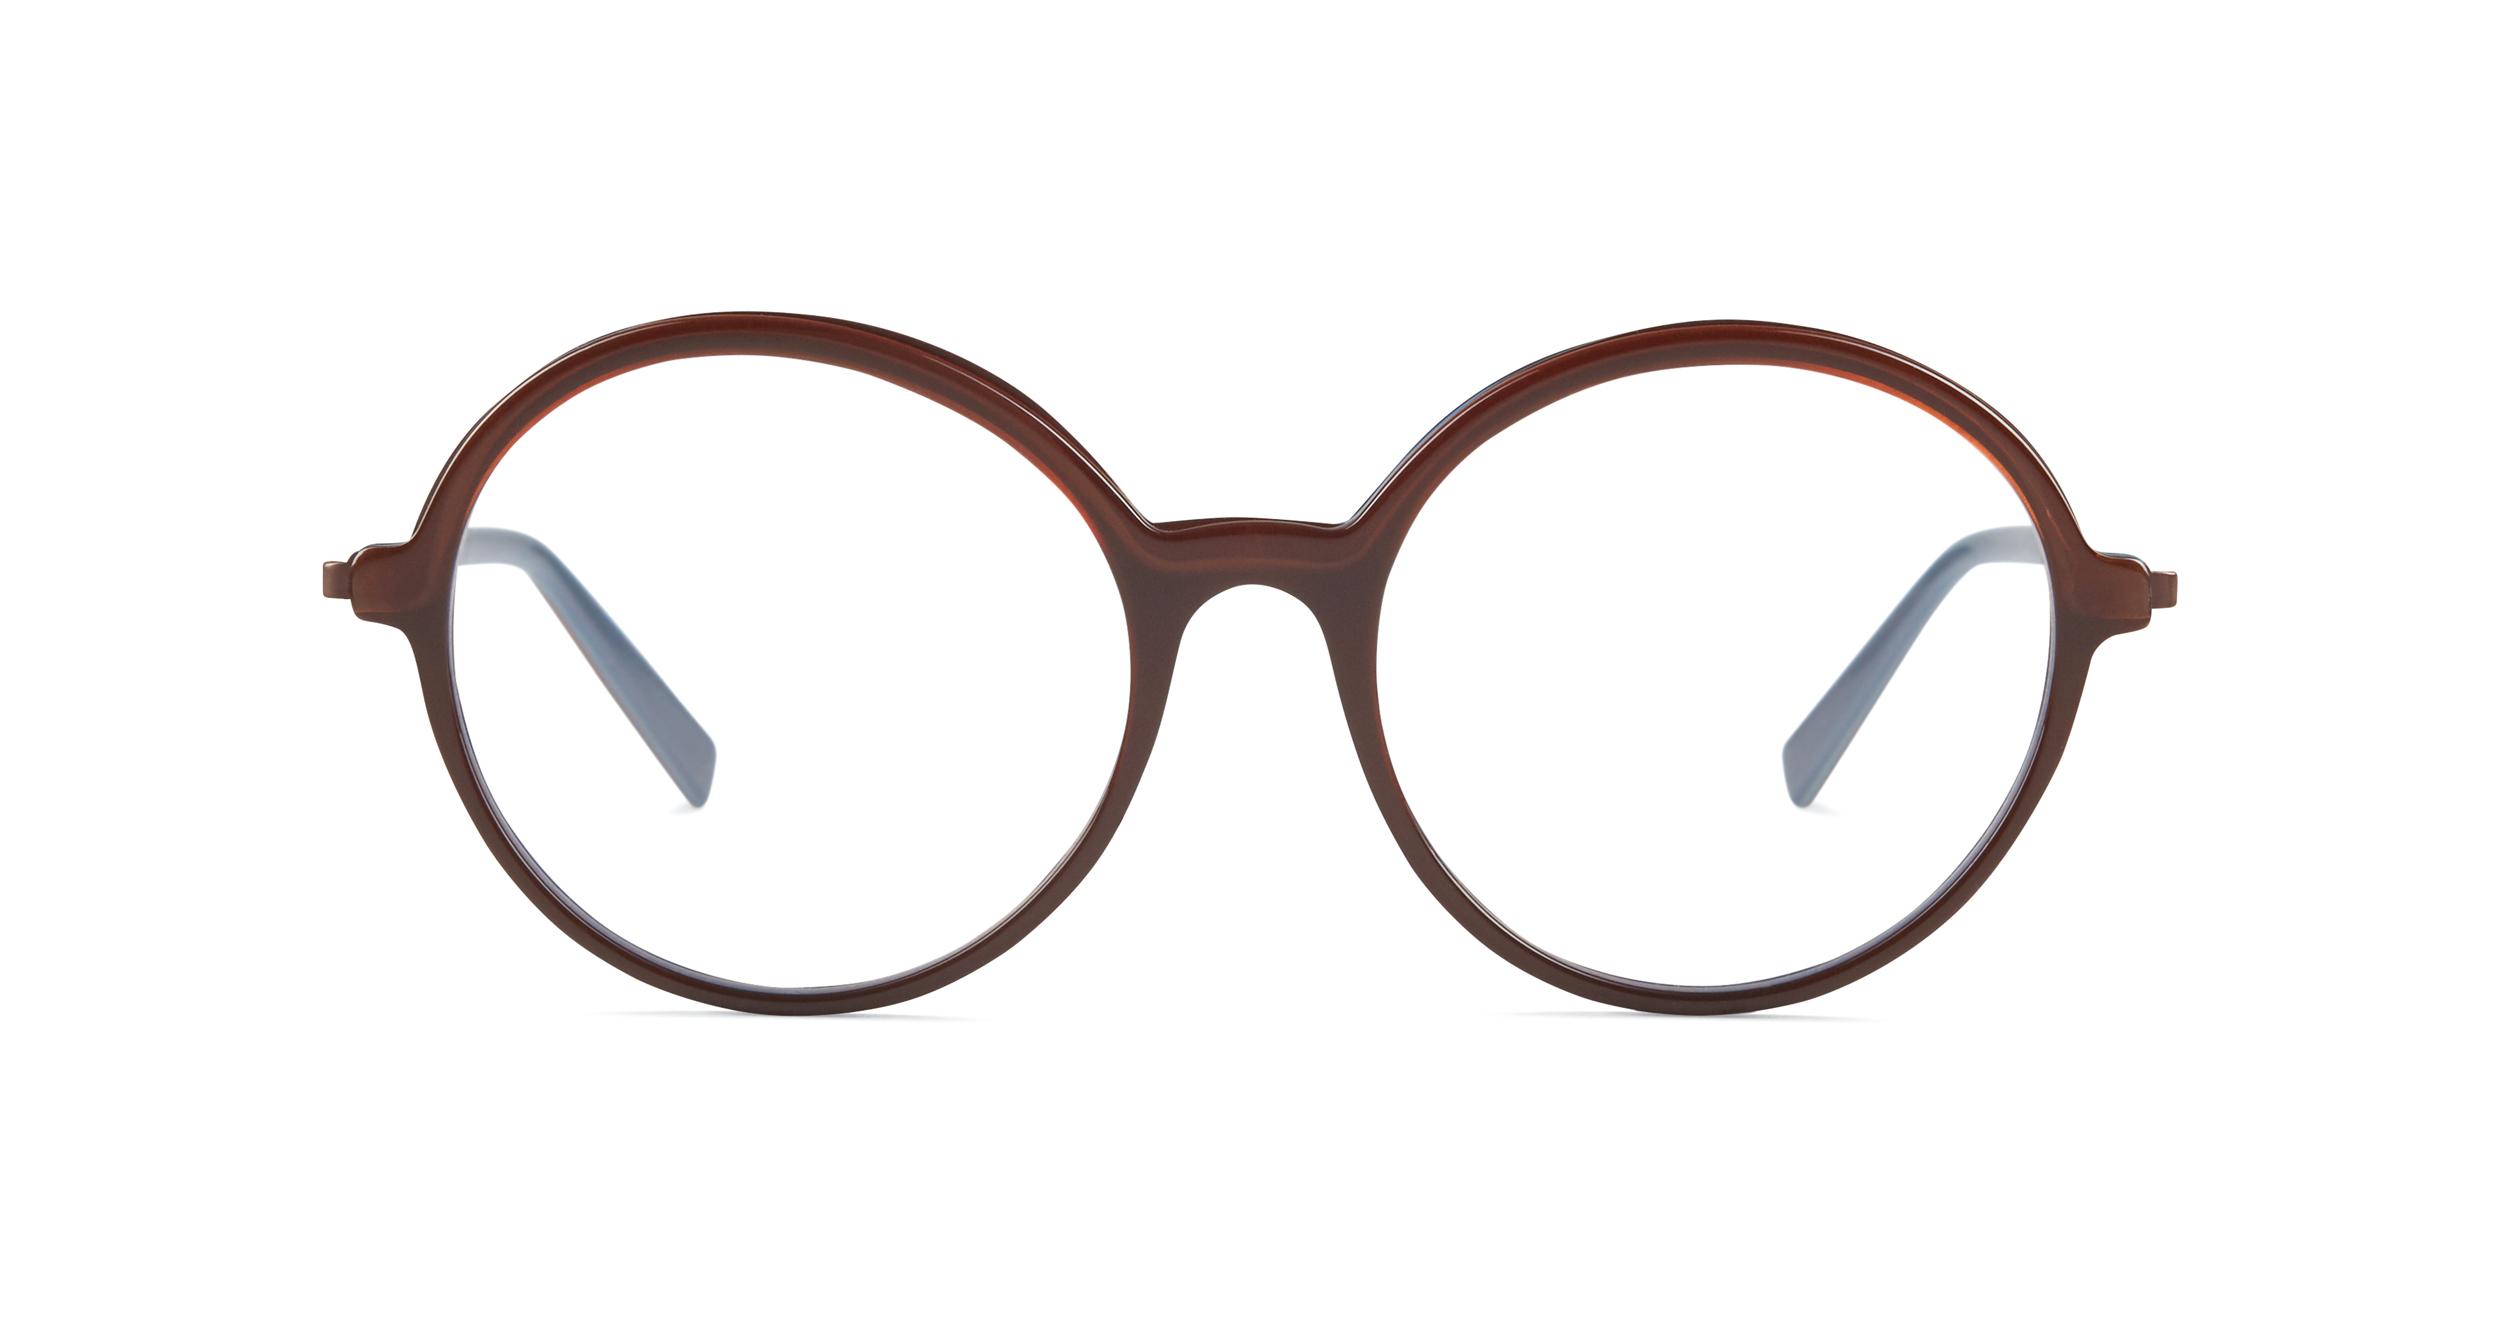 FLEYE | frame: page in burgundy brown, copper